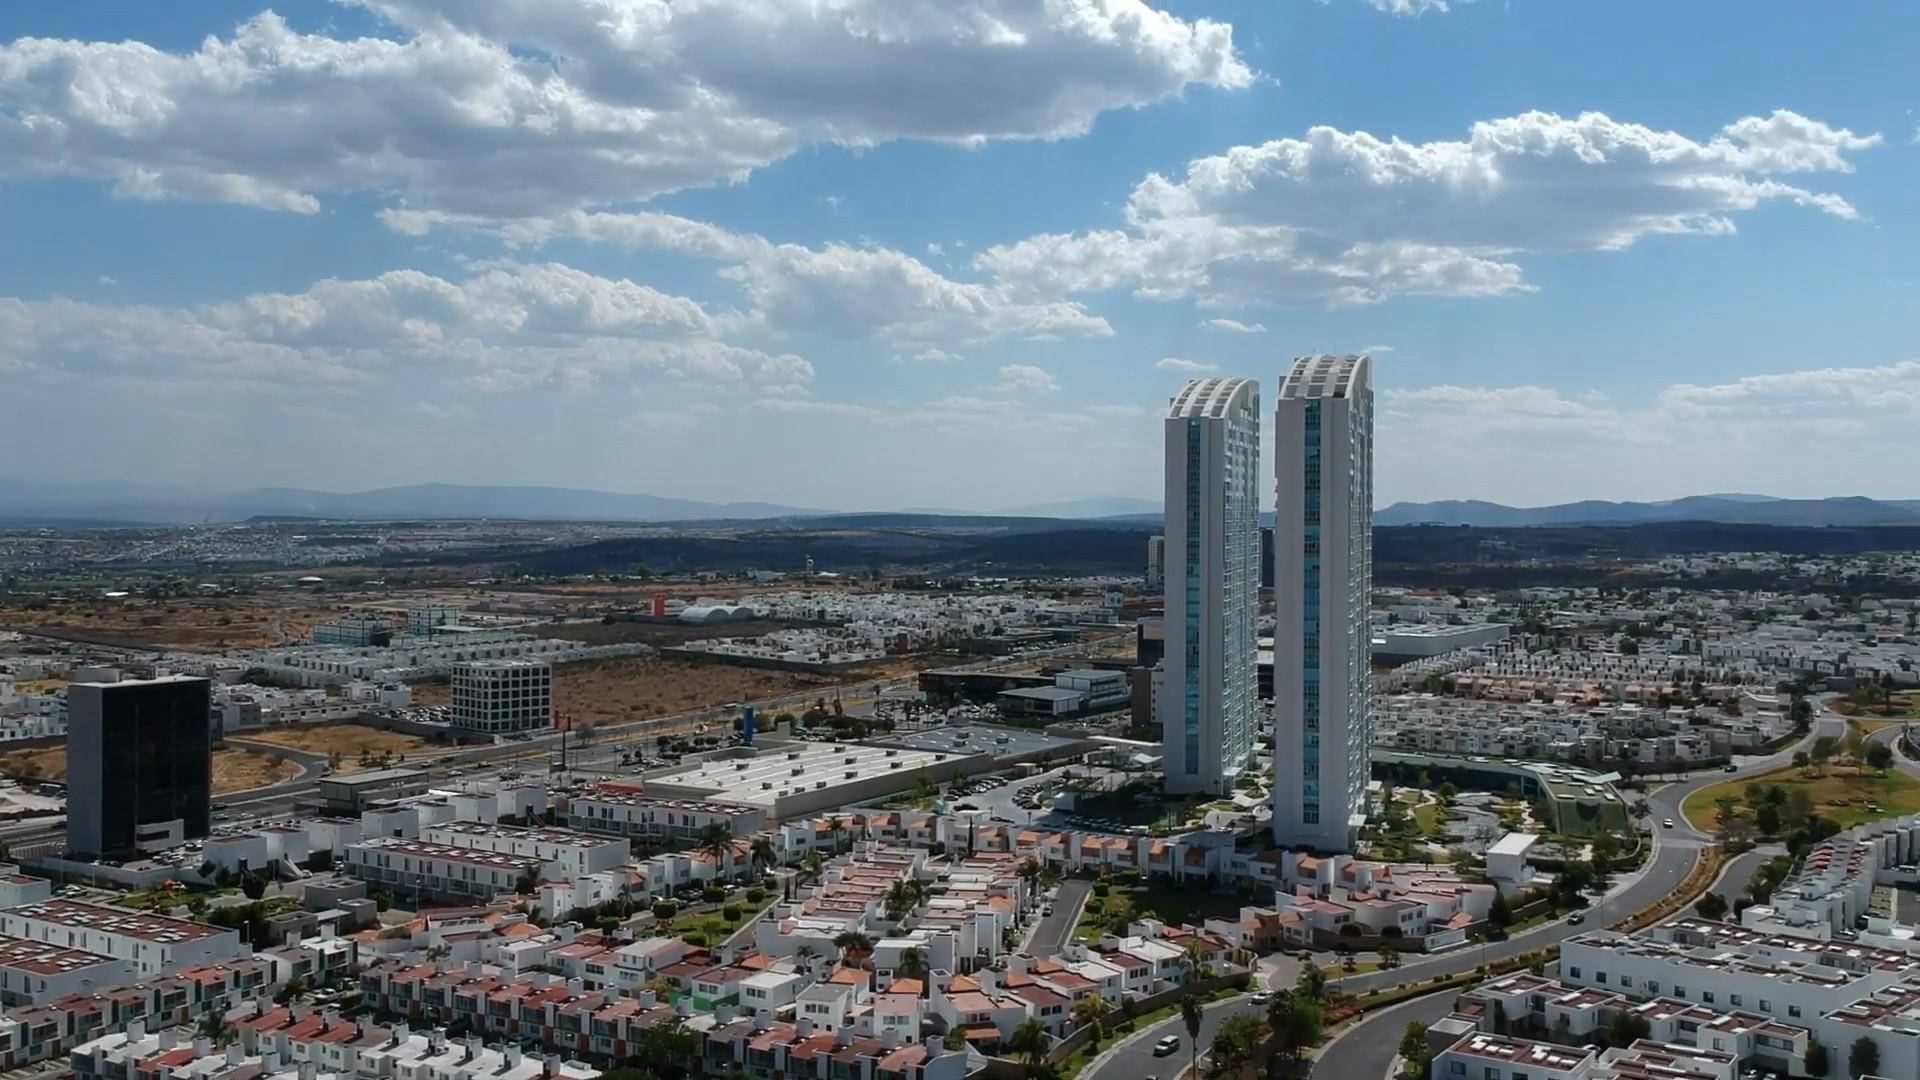 File:Juriquilla, Querétaro skyline torres Juriquilla Santa Fe 3 ...